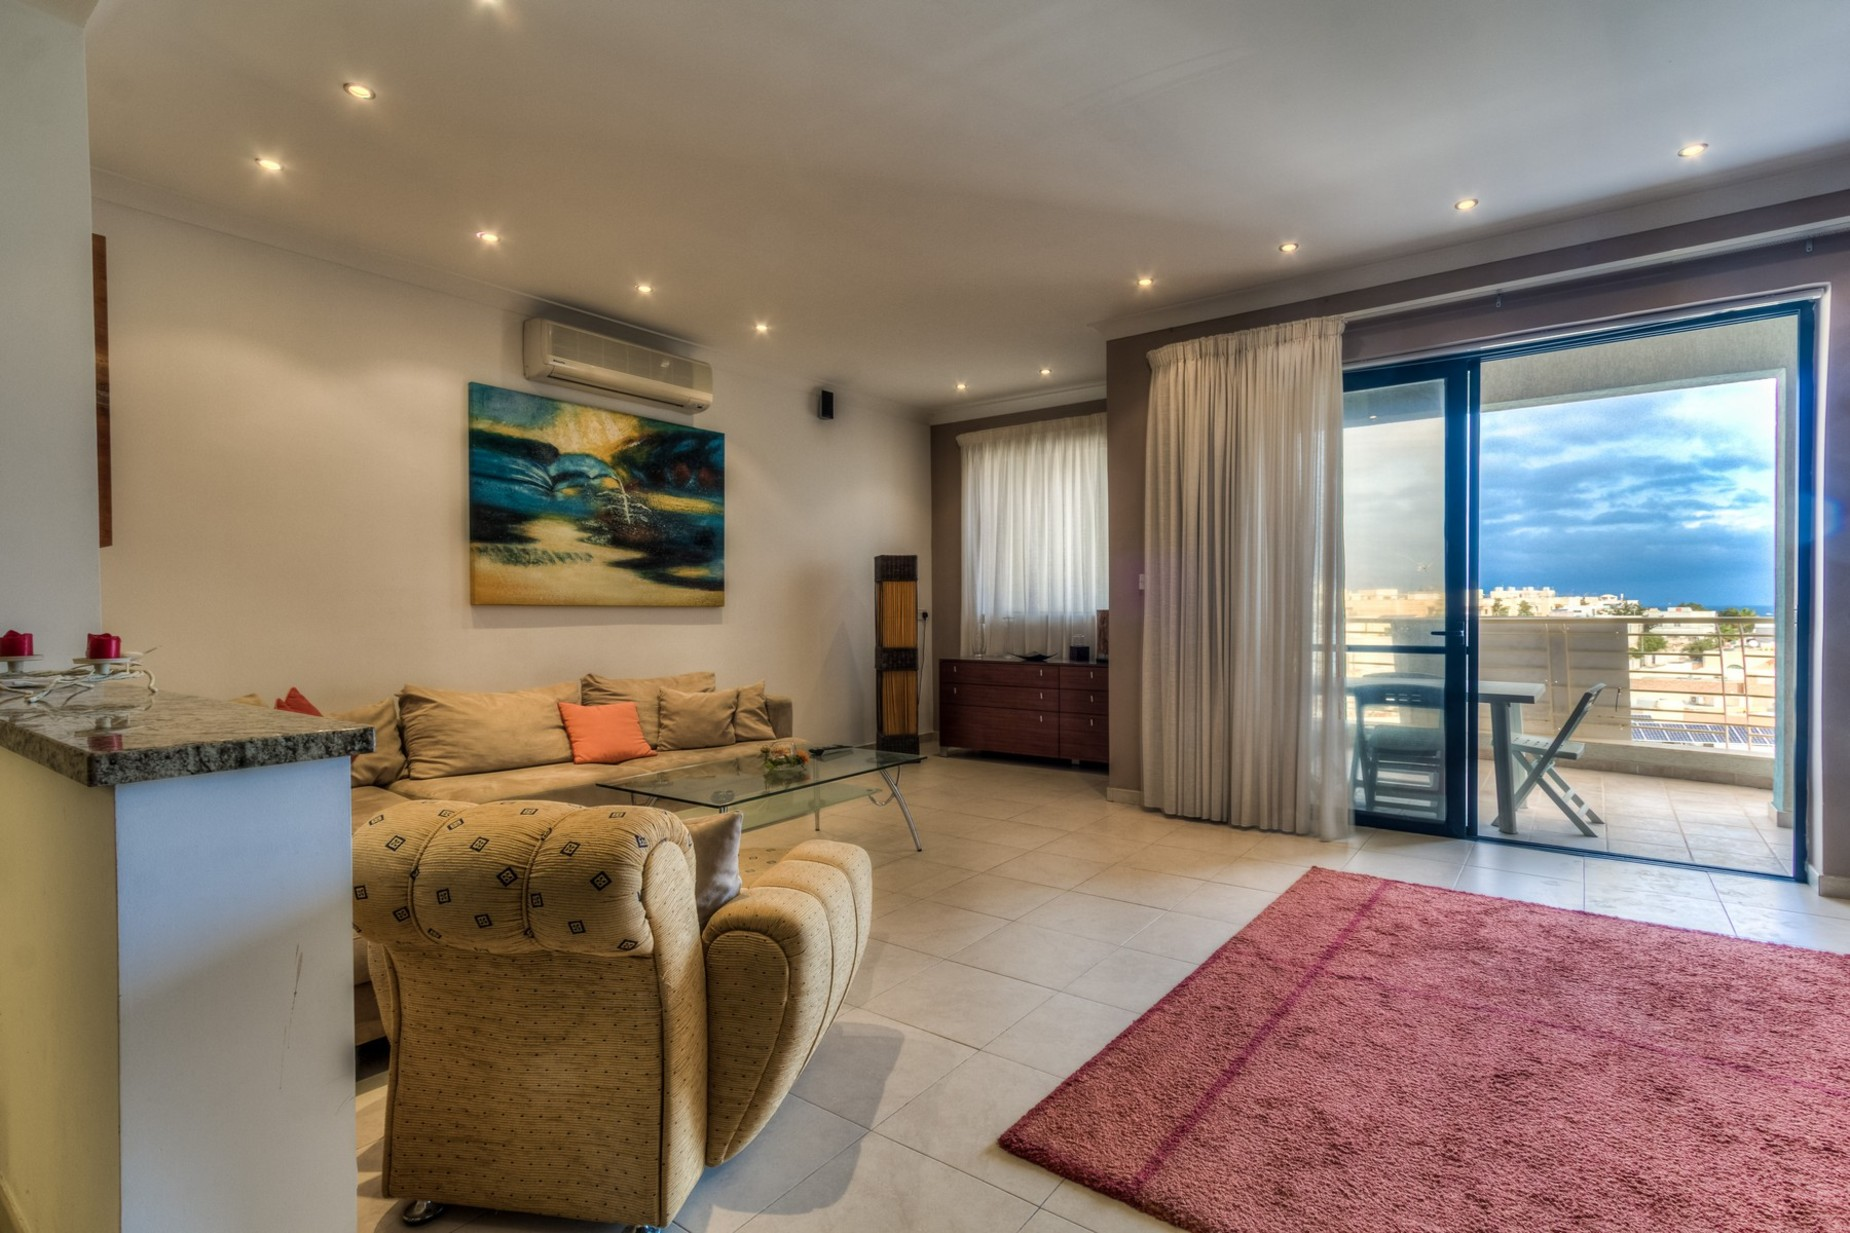 3 bed Apartment For Sale in Qawra, Qawra - thumb 4